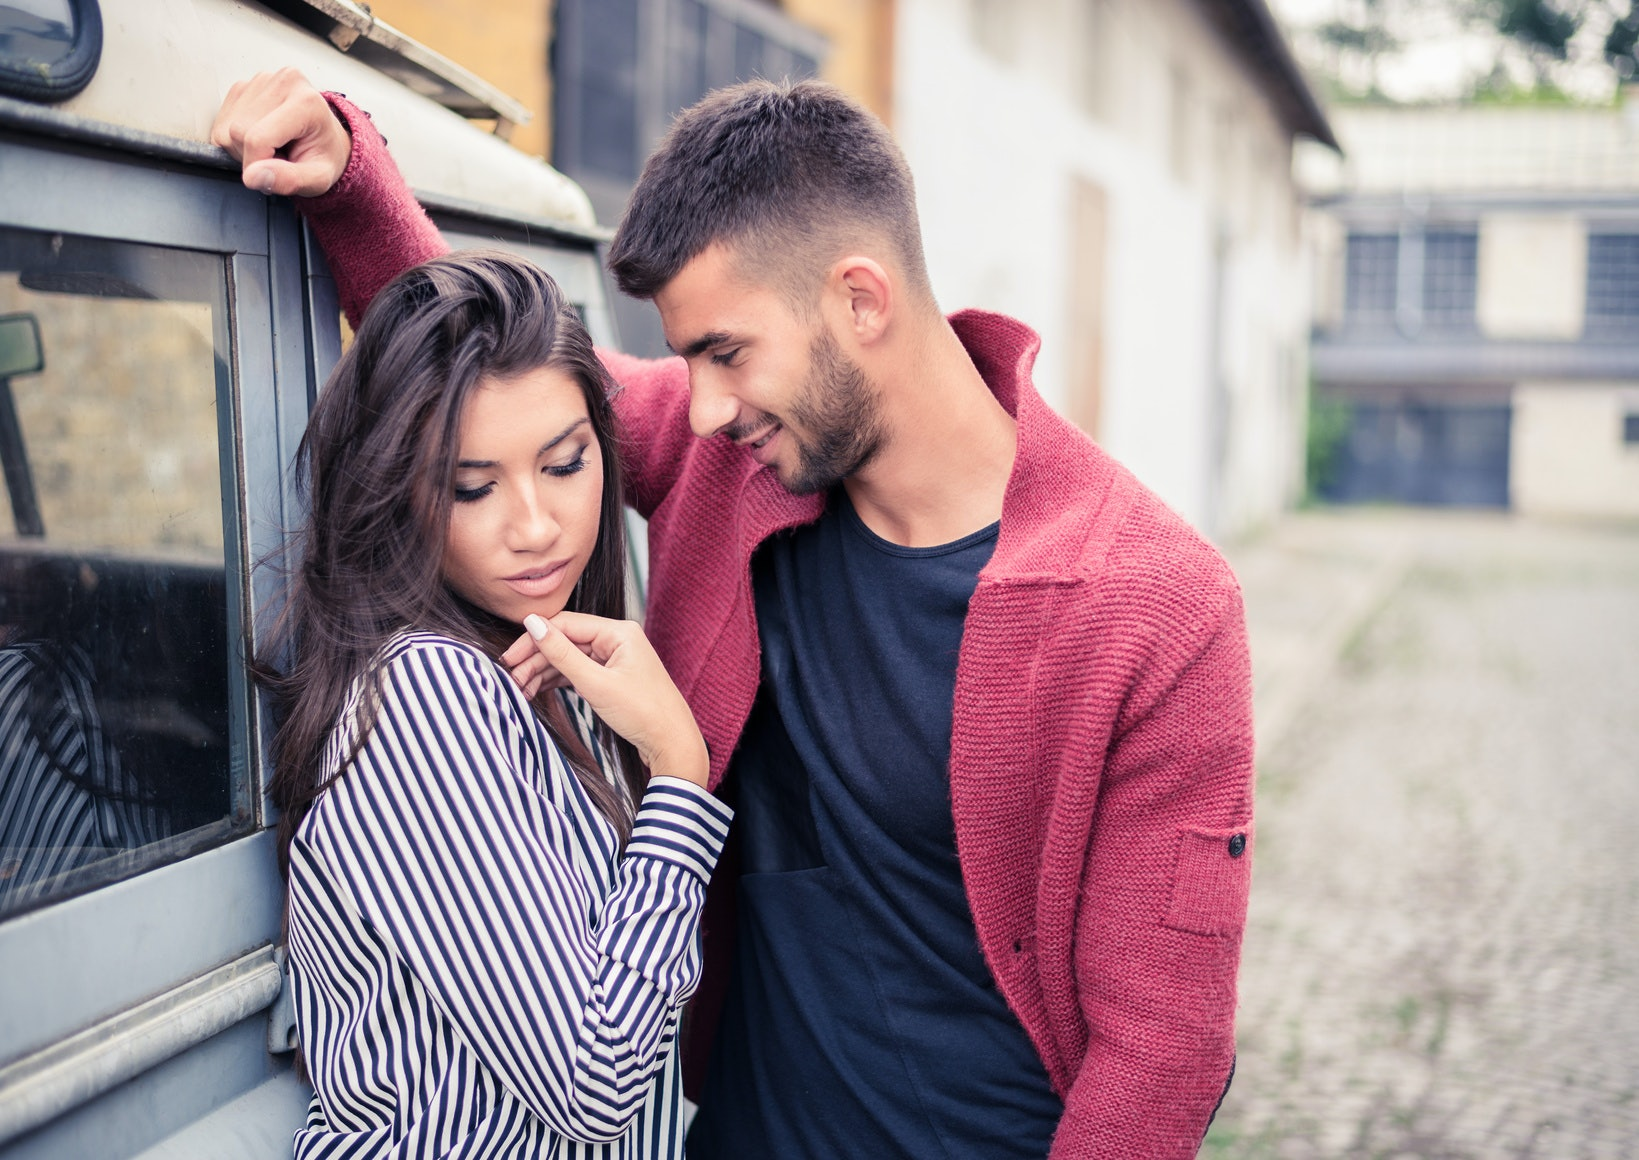 Classifying dating